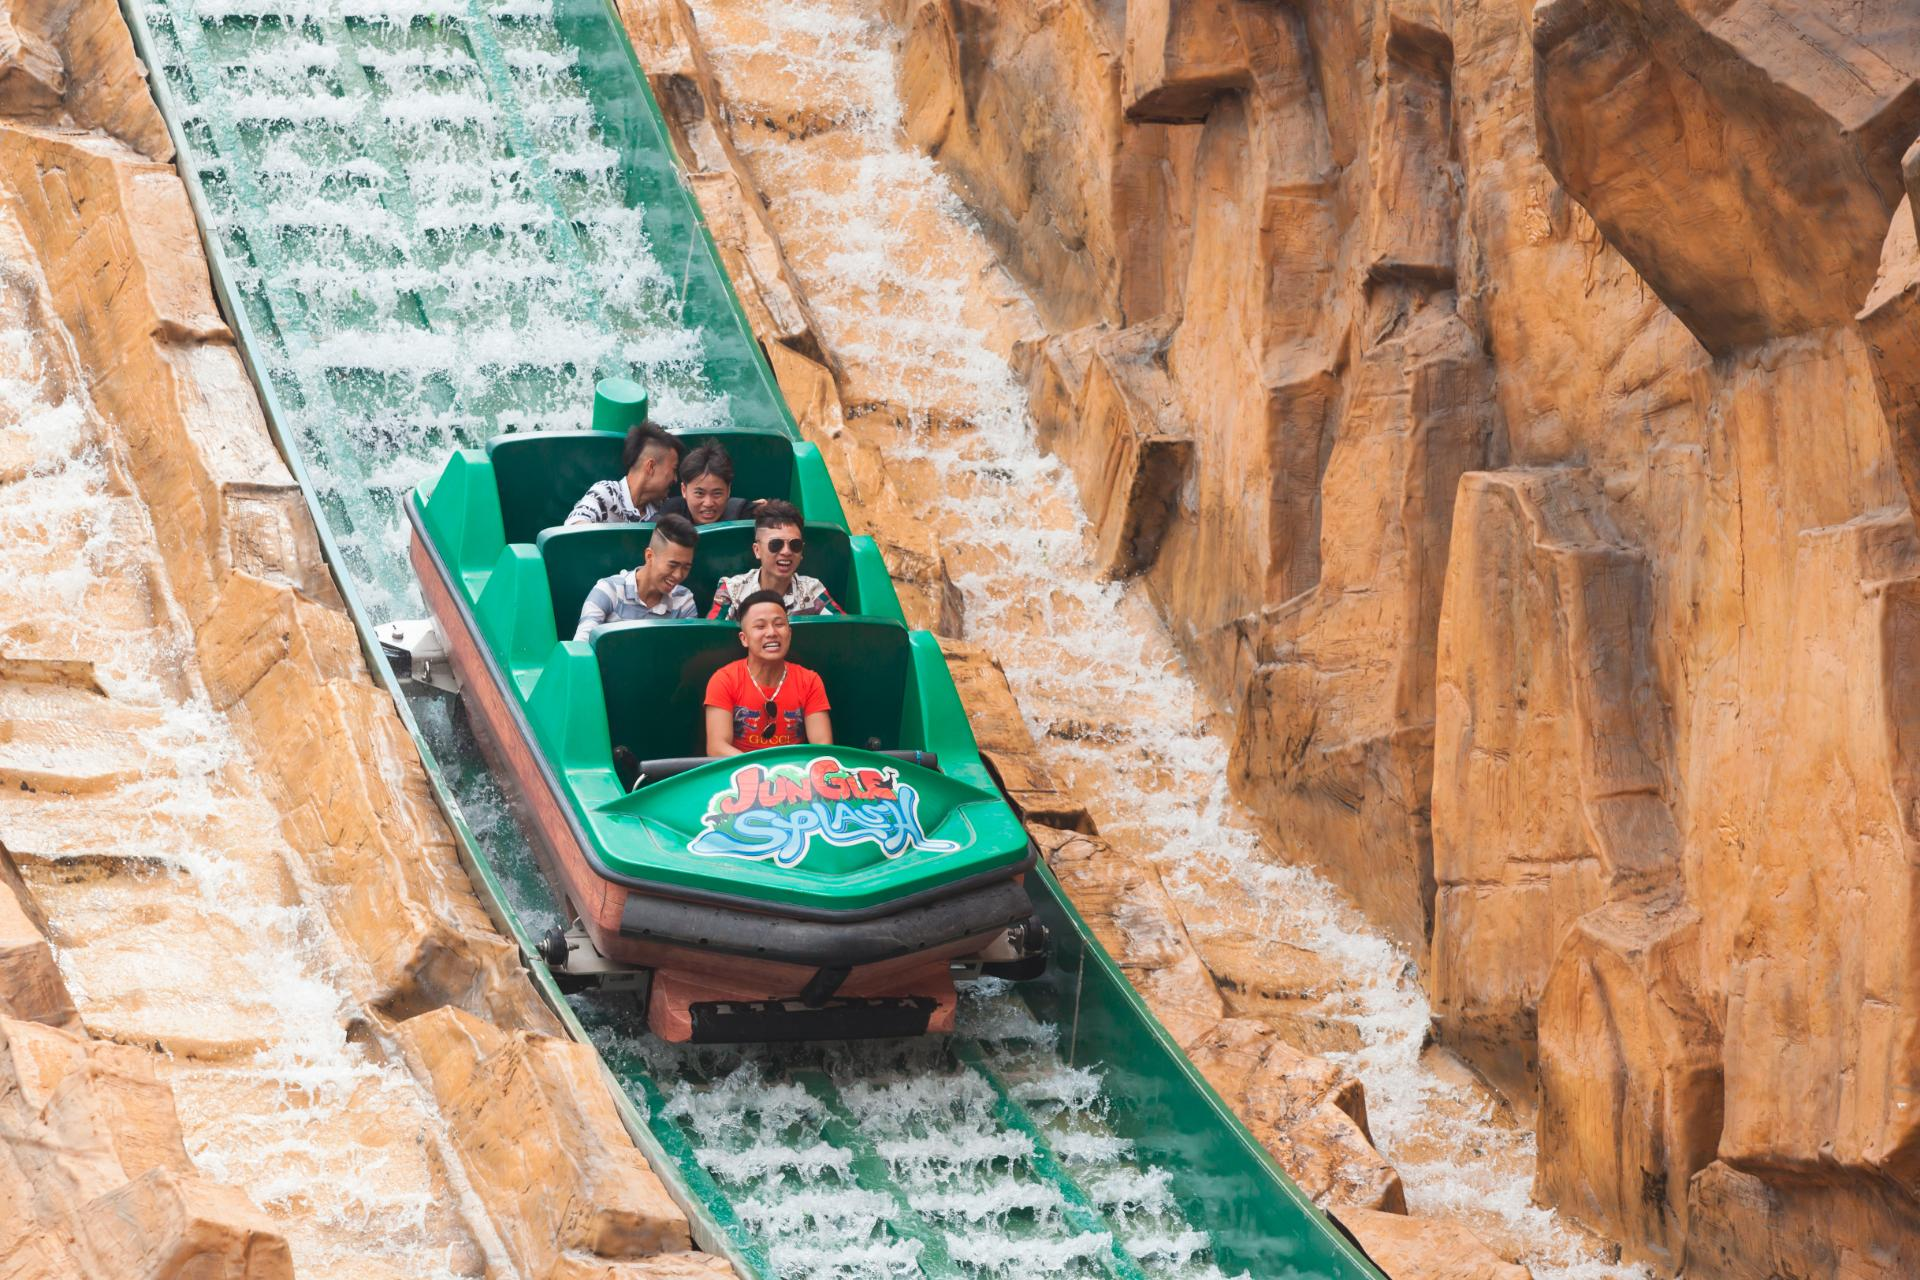 Interlink-Jungle Splash, Bao Son Paradise Park, Hanoi, Vietnam - SuperFlume, water ride